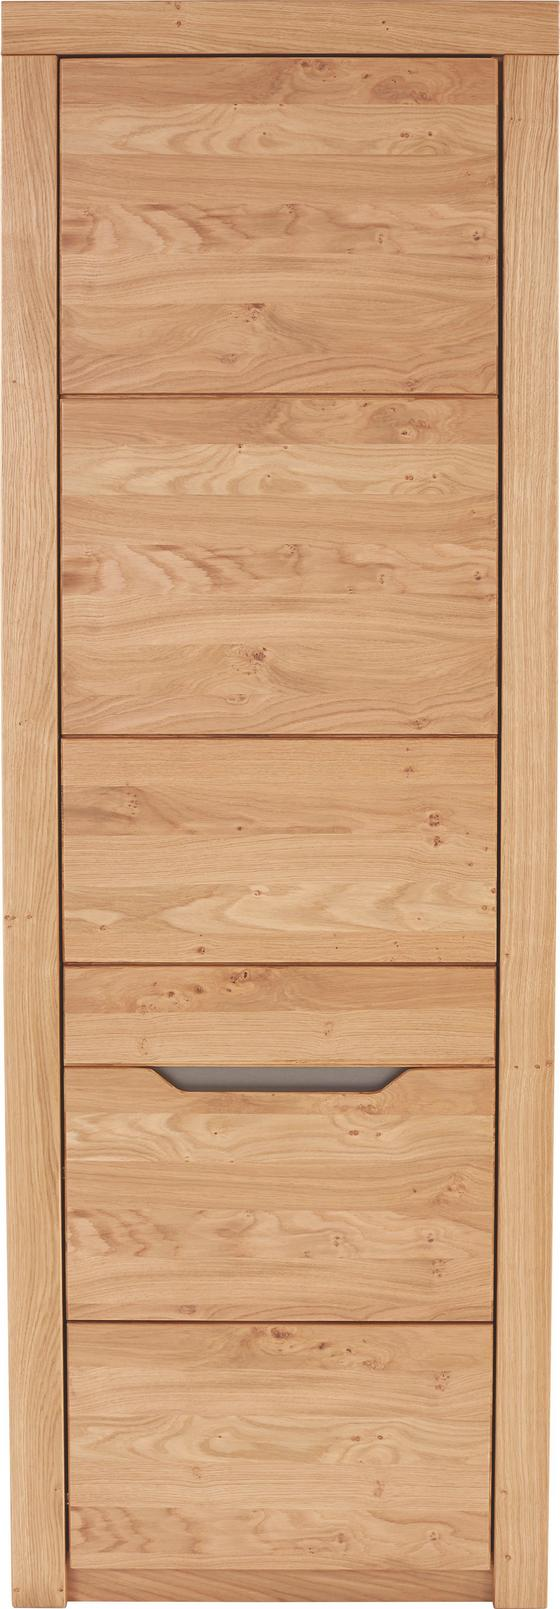 Szekrény Pure - modern, fa/faanyagok (64/197/38cm)